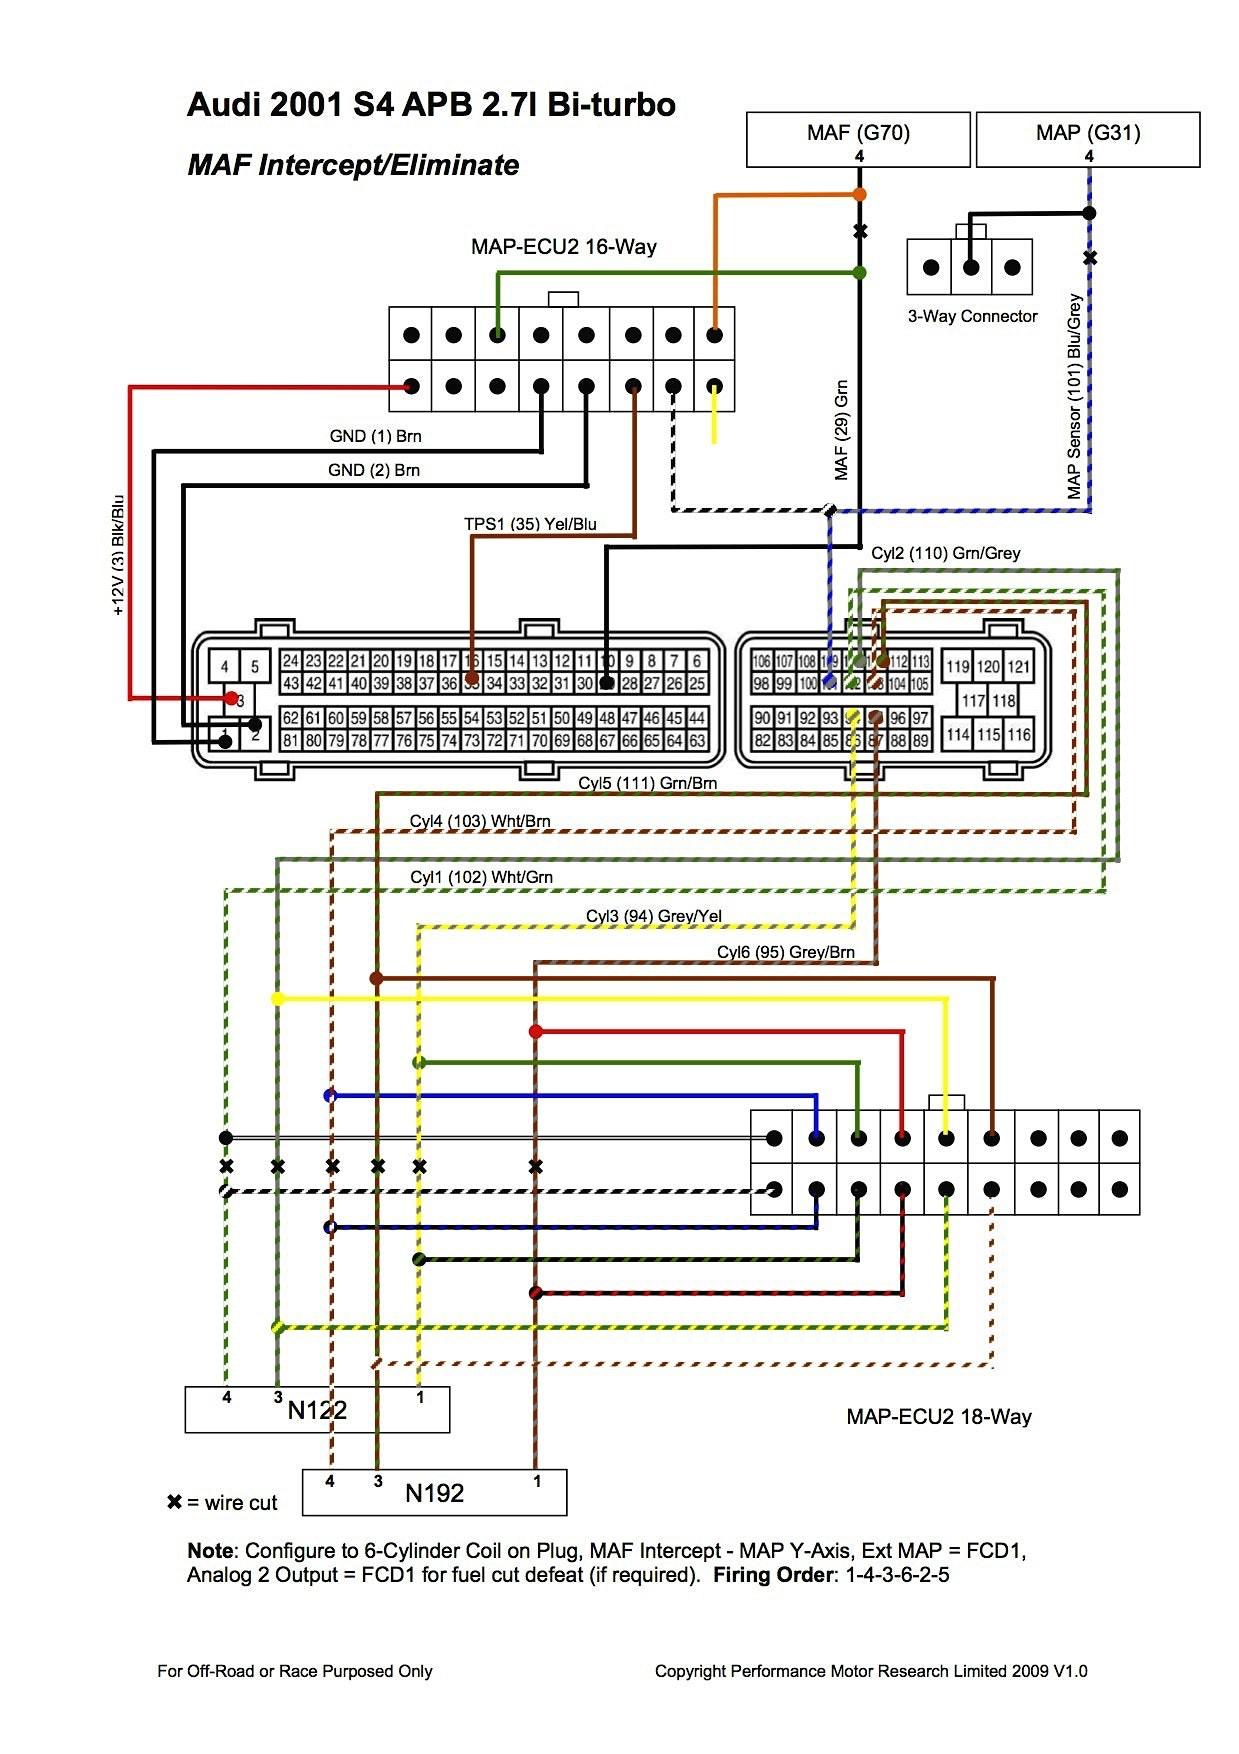 2000 vw beetle radio wiring diagram wiring diagram technic 1998 volkswagen beetle radio wiring diagram 2000